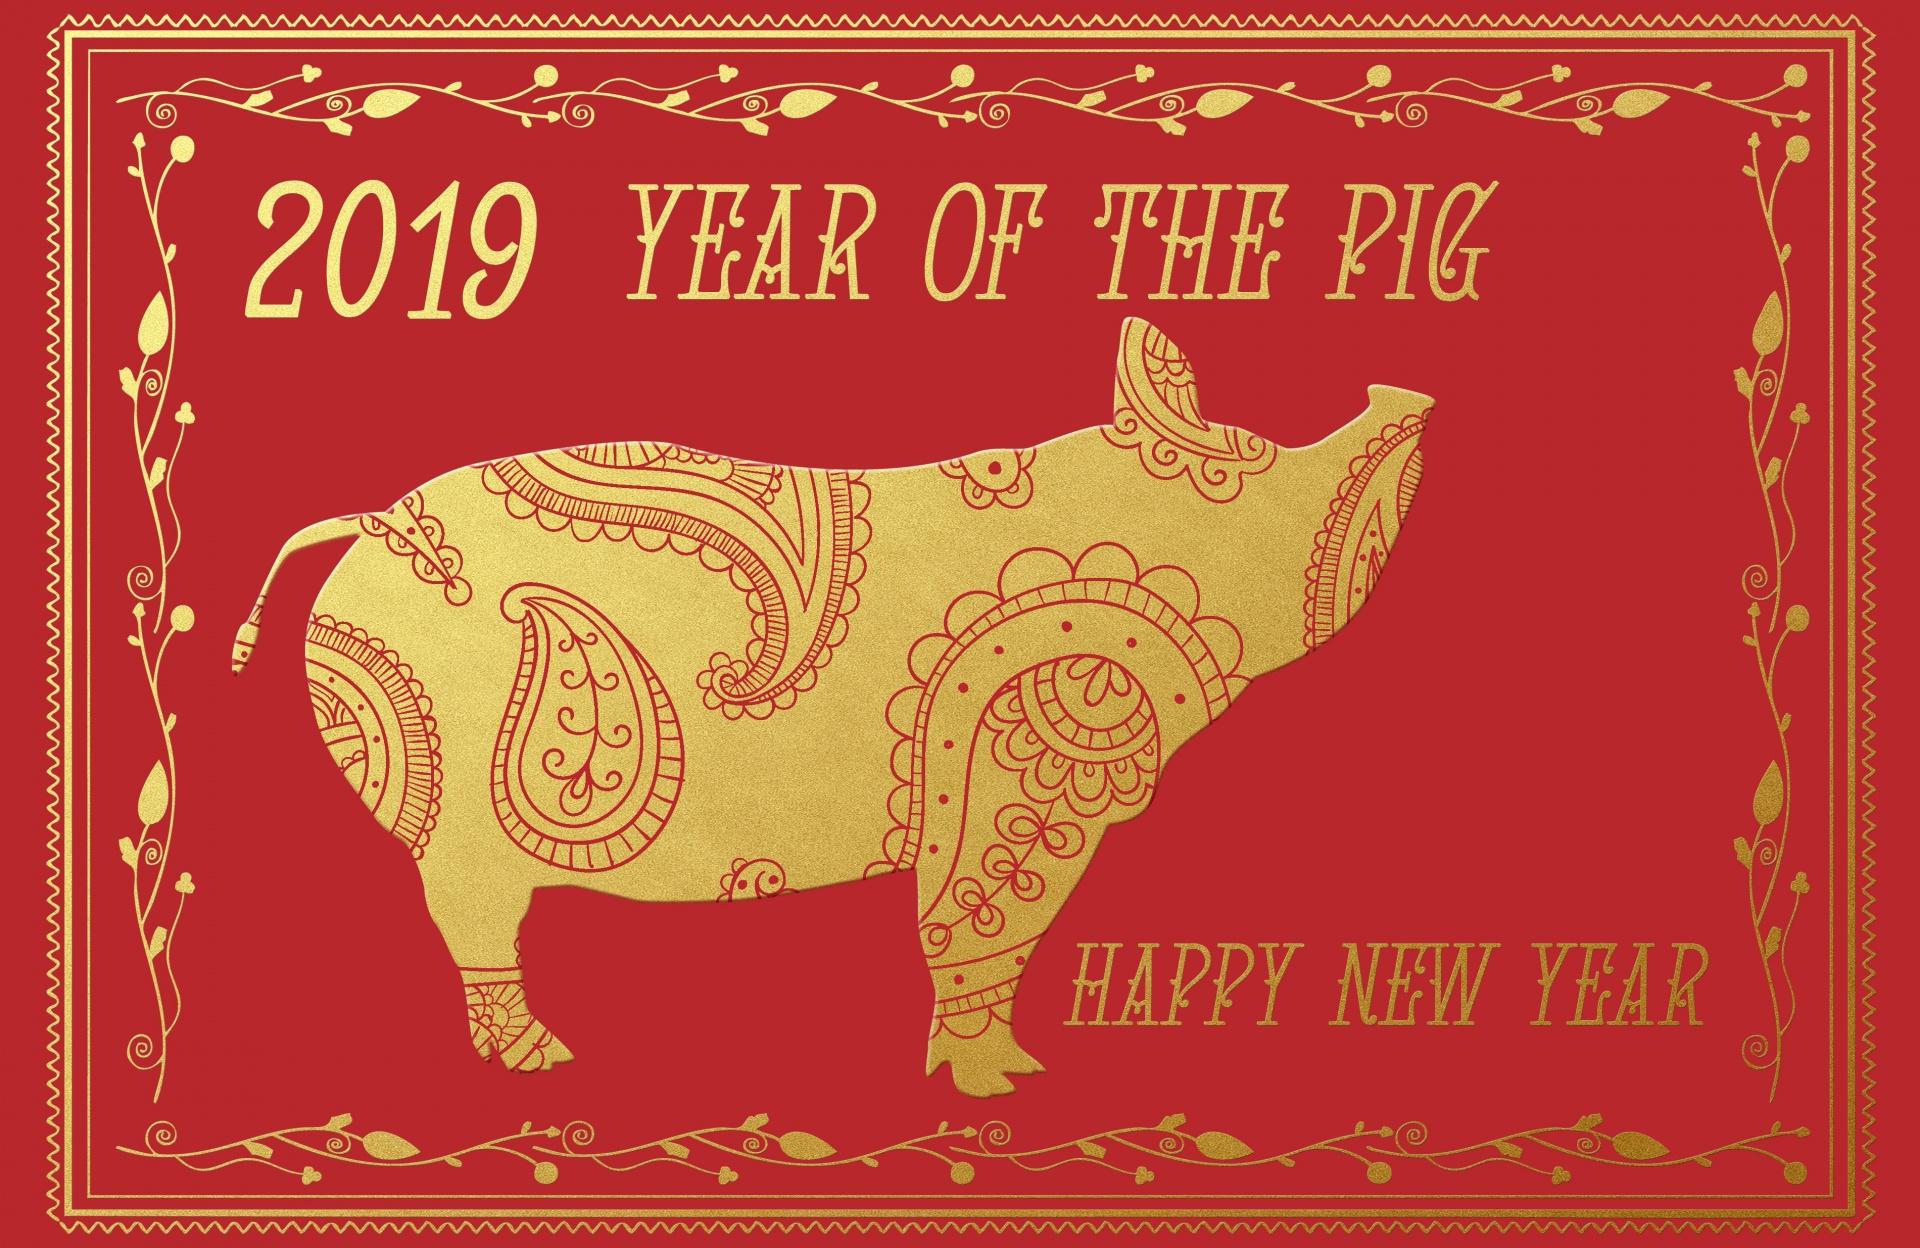 2019 year of pig.jpg